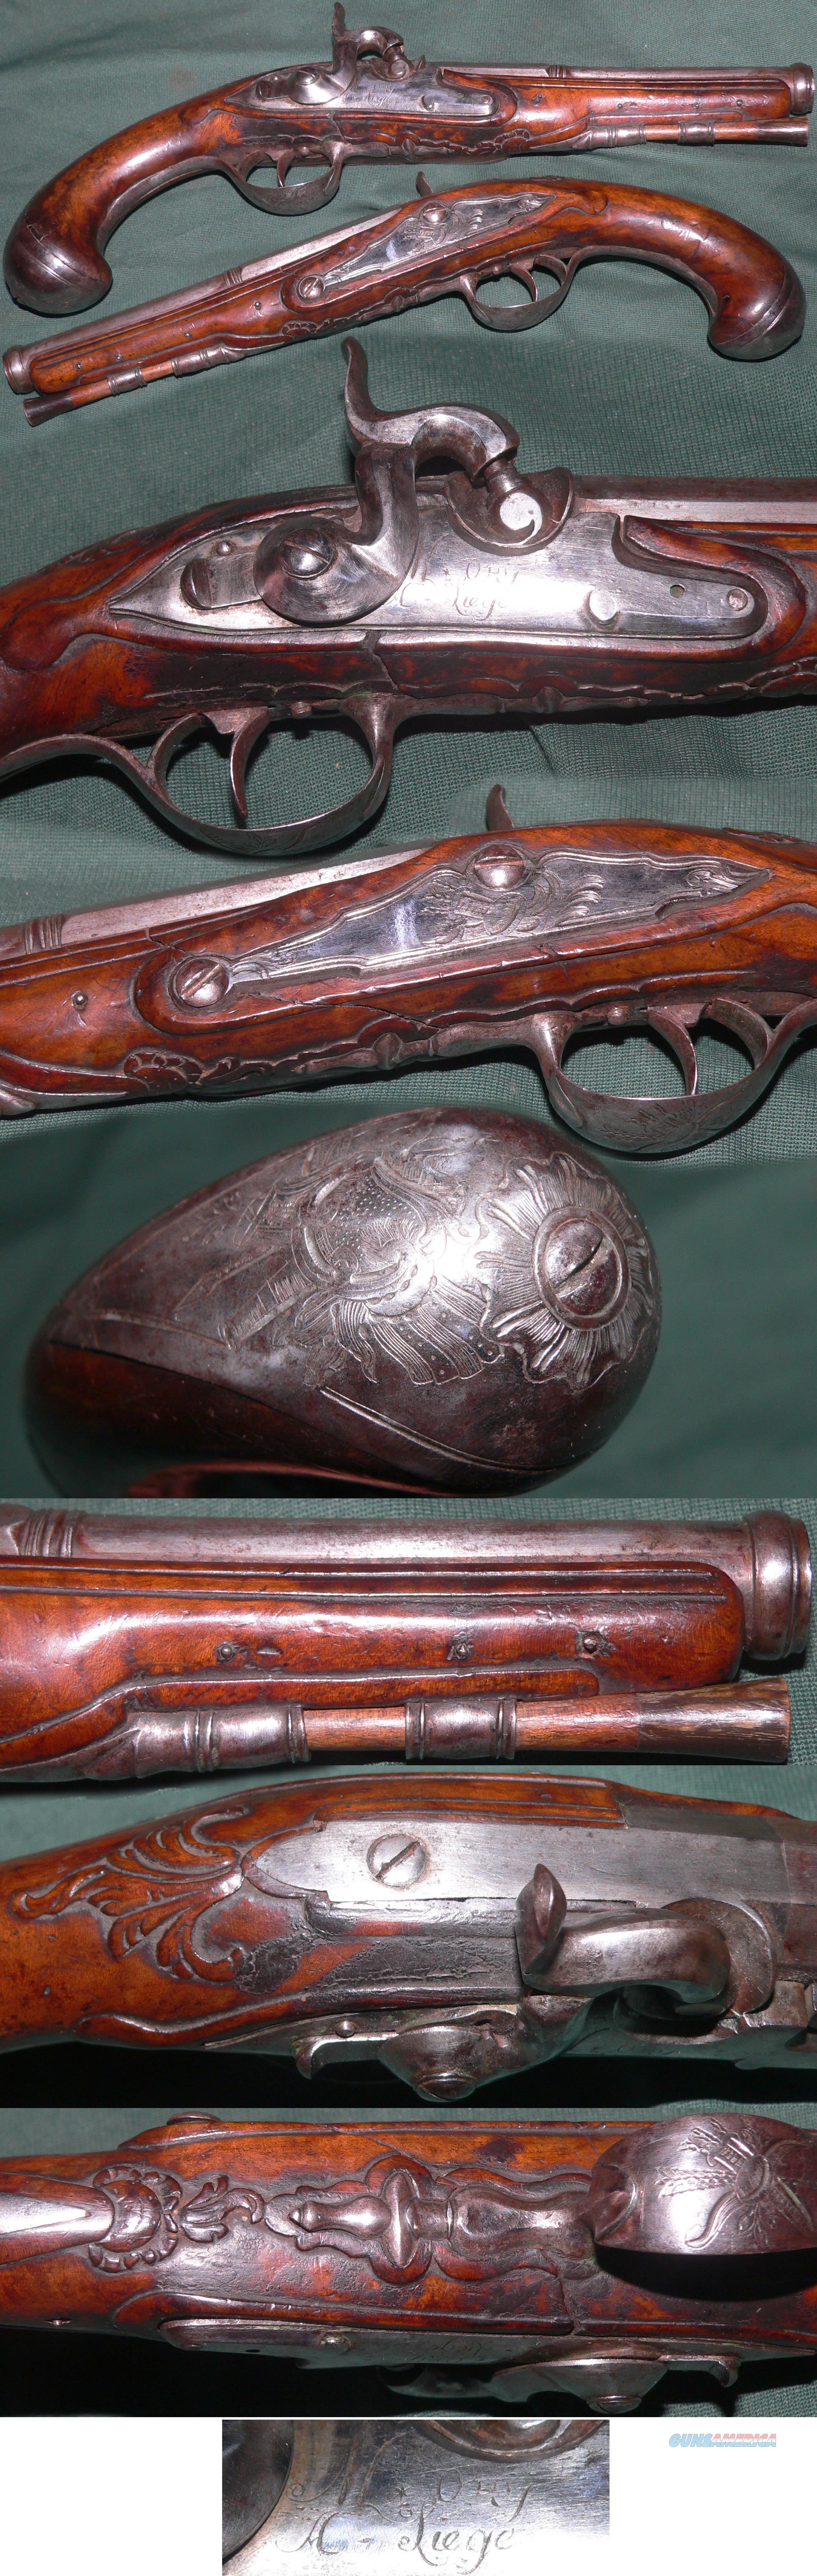 "beautiful C1750-80 European pistol by ""Lory a Liege""  Guns > Pistols > Muzzleloading Pre-1899 Pistols (perc)"